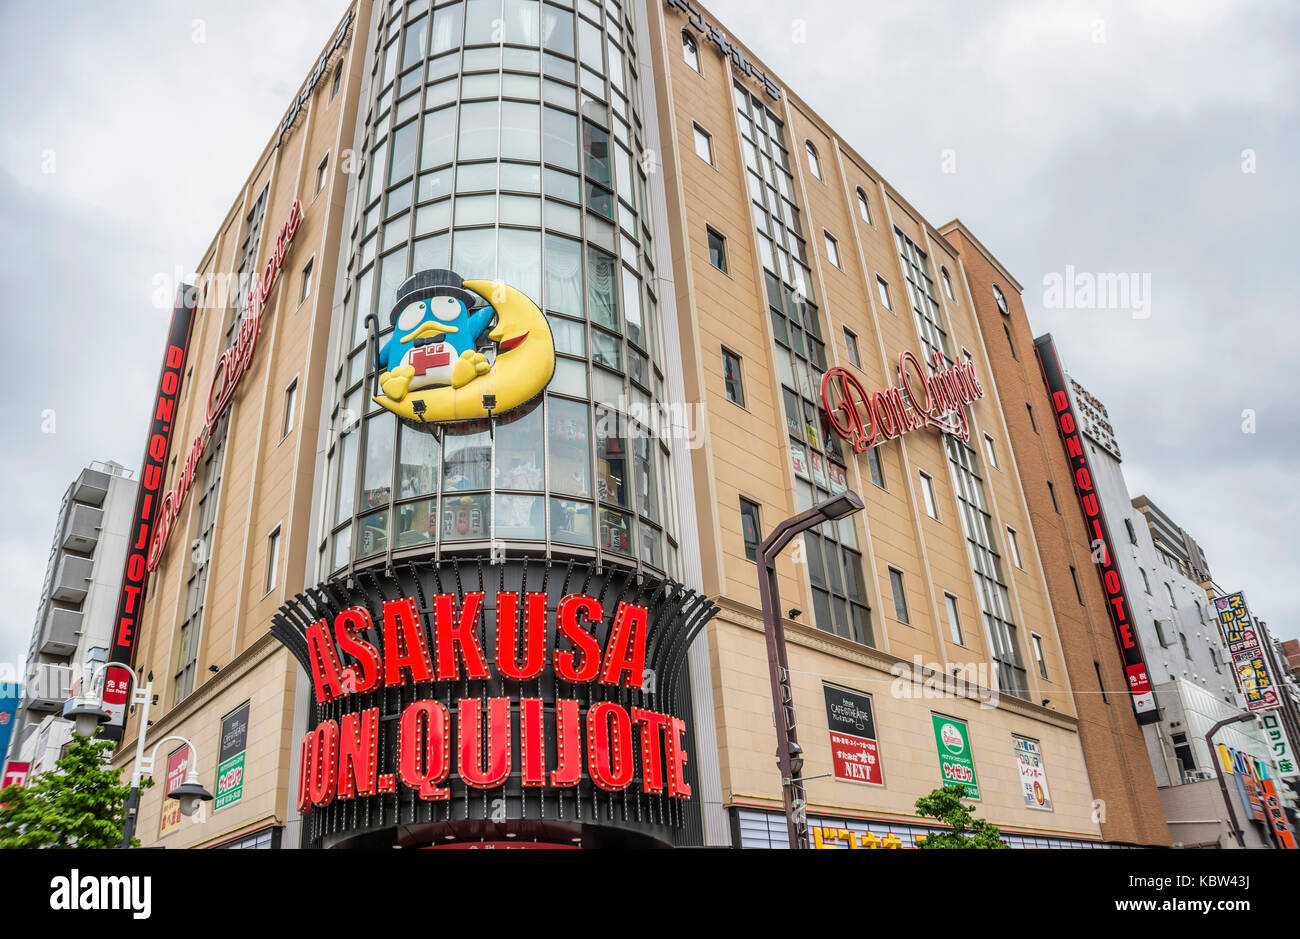 Exterior of Asakusa Don Quijote Department Store, Tokyo, Japan   Aussenansicht des Asakusa Don Quijote Kaufhauses, - Stock Image